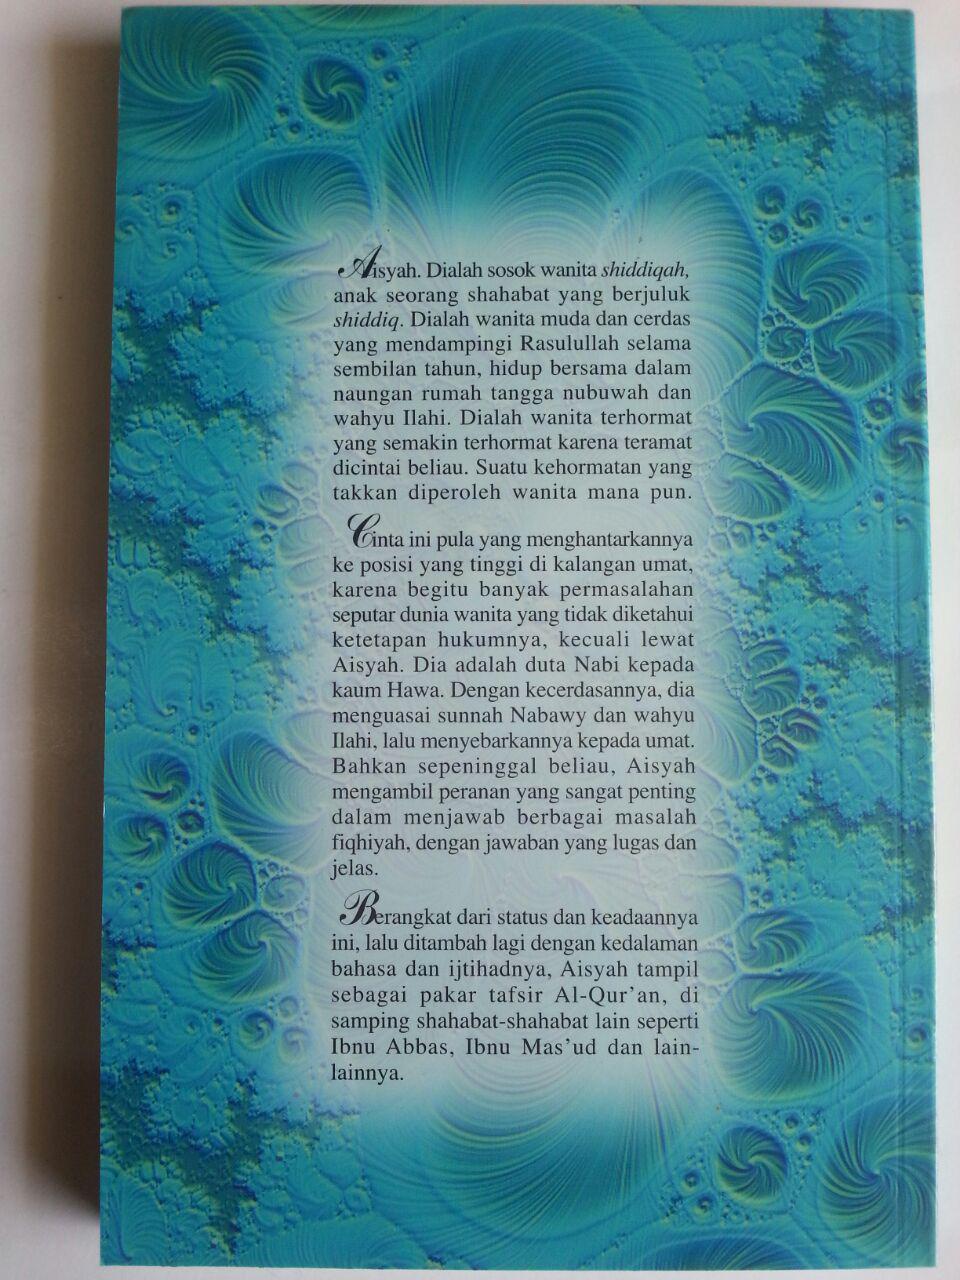 Buku Tafsir Aisyah Ummul Mukminin cover